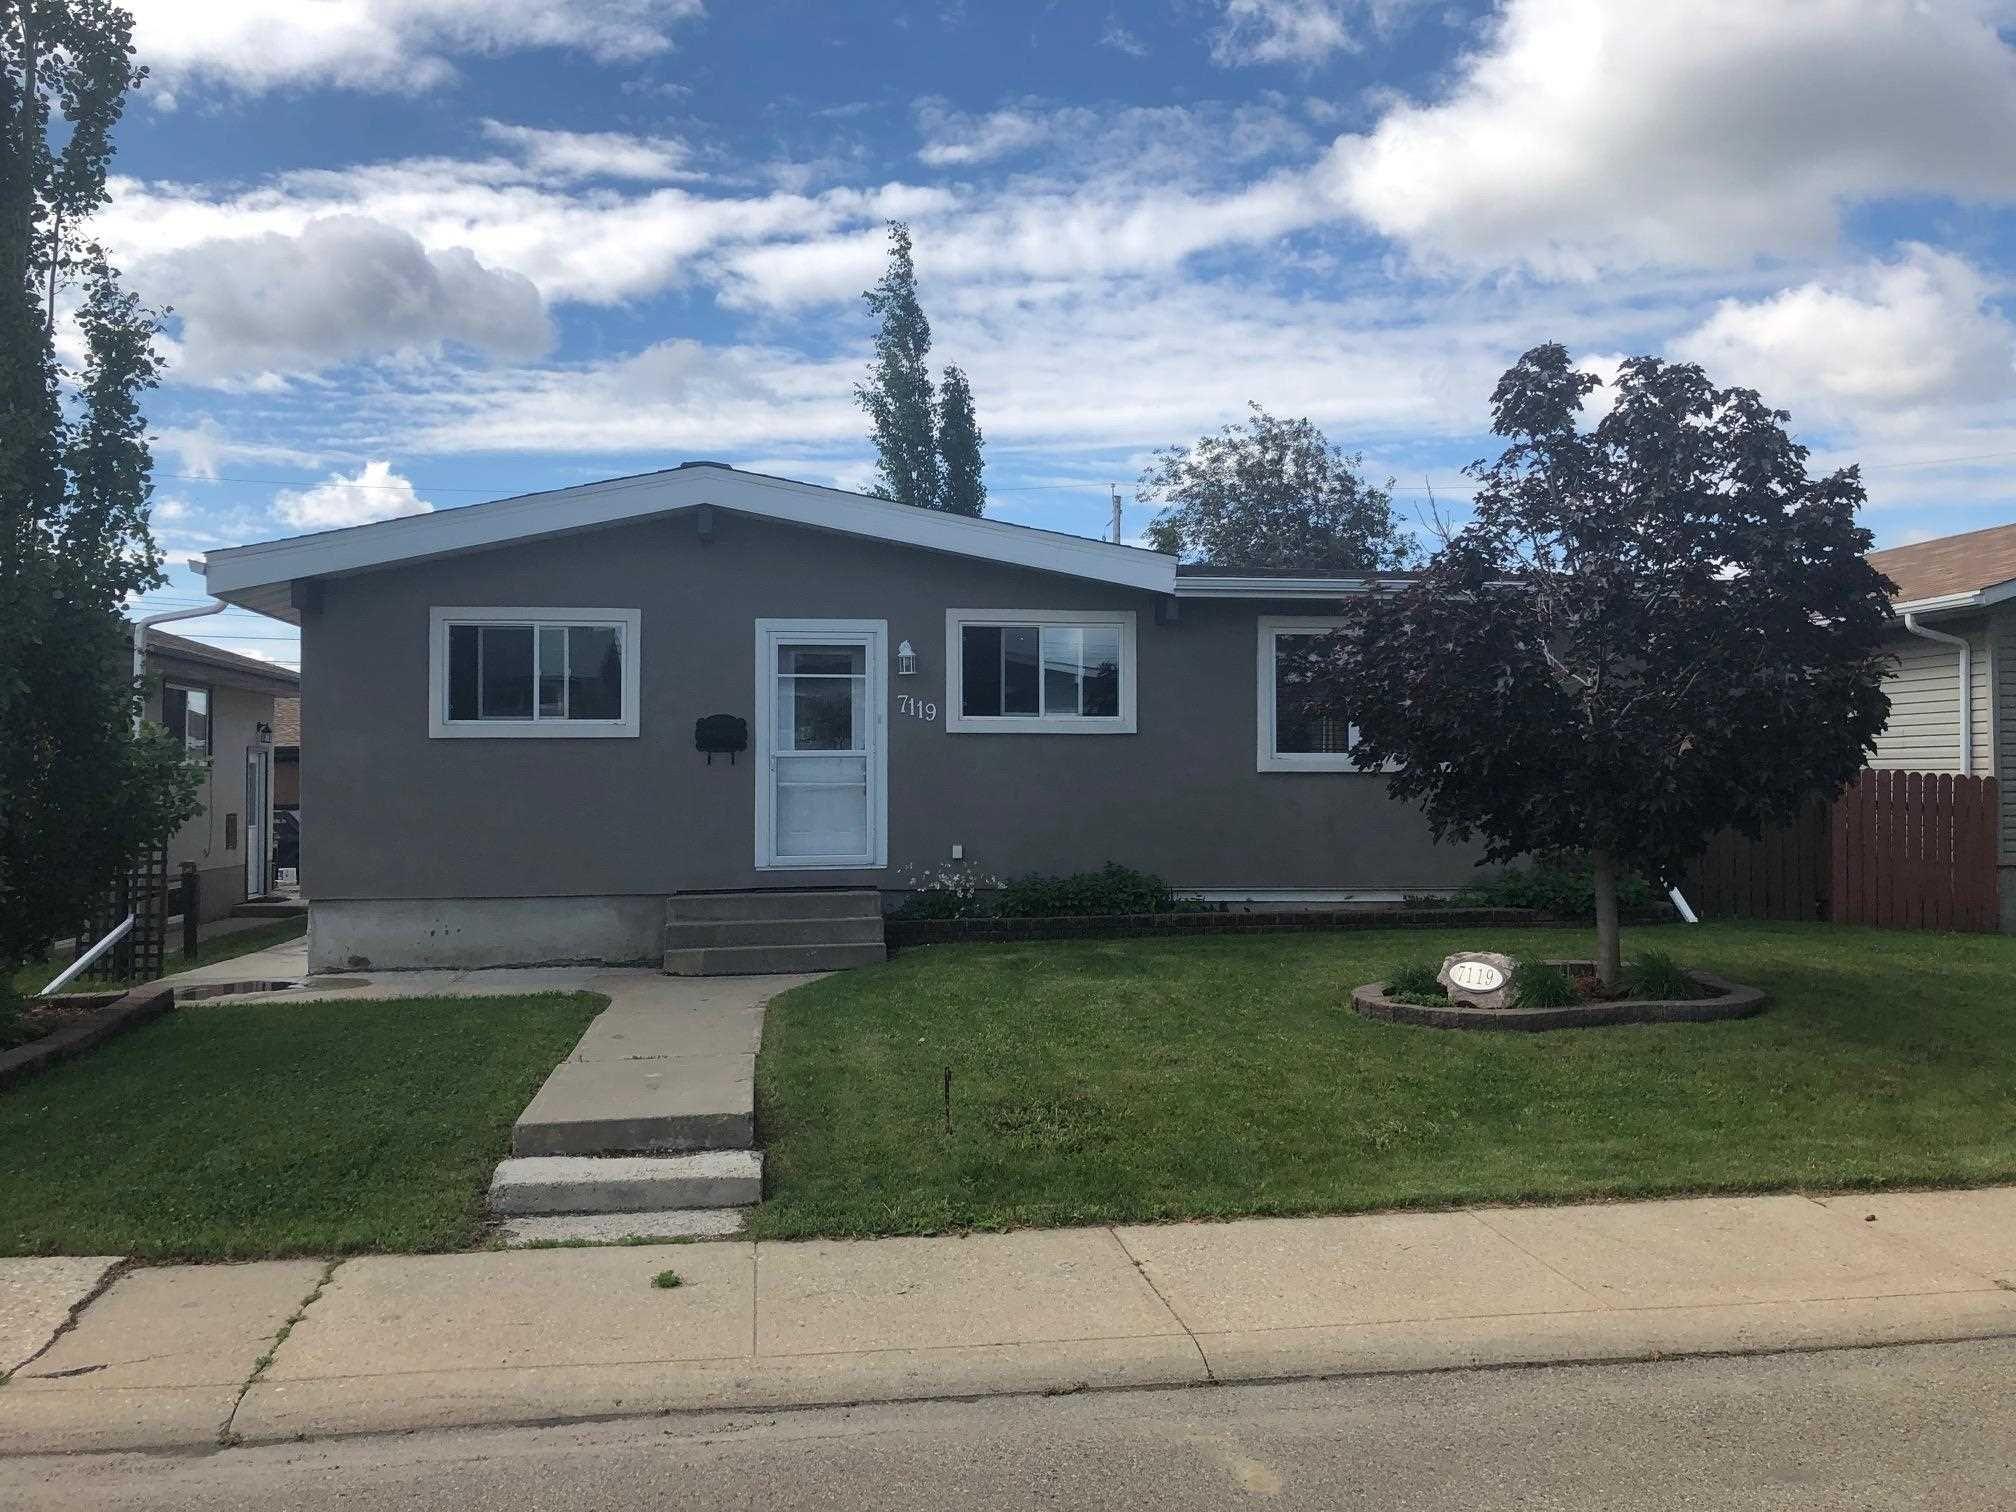 Main Photo: 7119 136 Avenue in Edmonton: Zone 02 House for sale : MLS®# E4250837